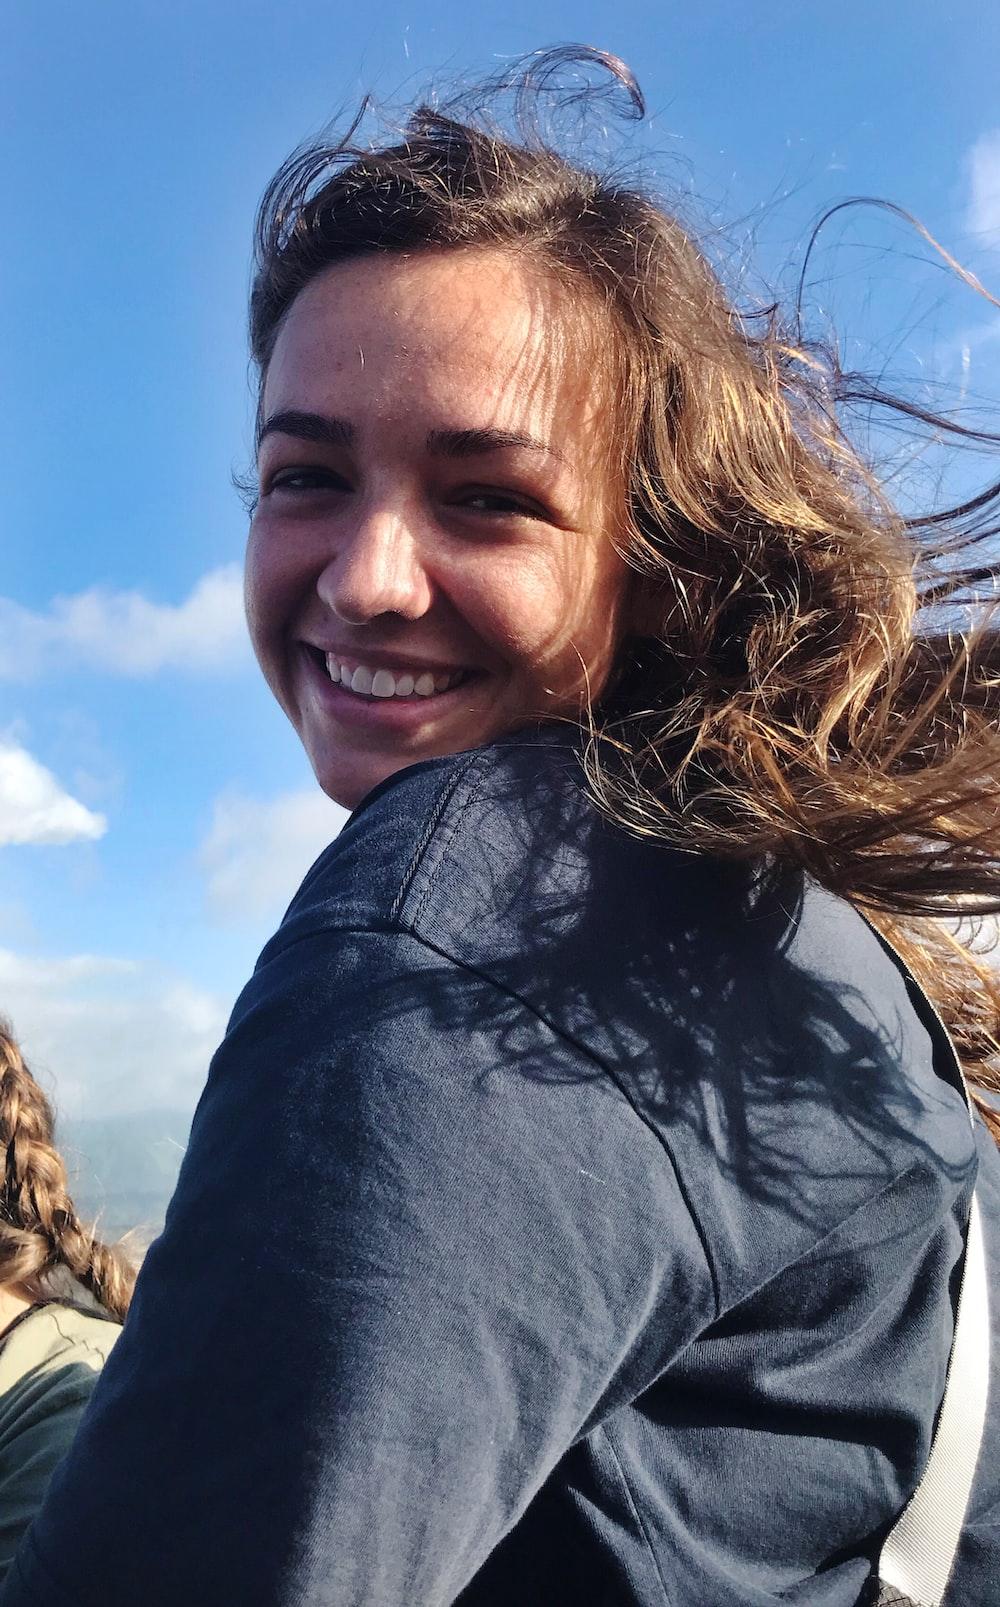 smiling woman wearing blue long-sleeved shirt